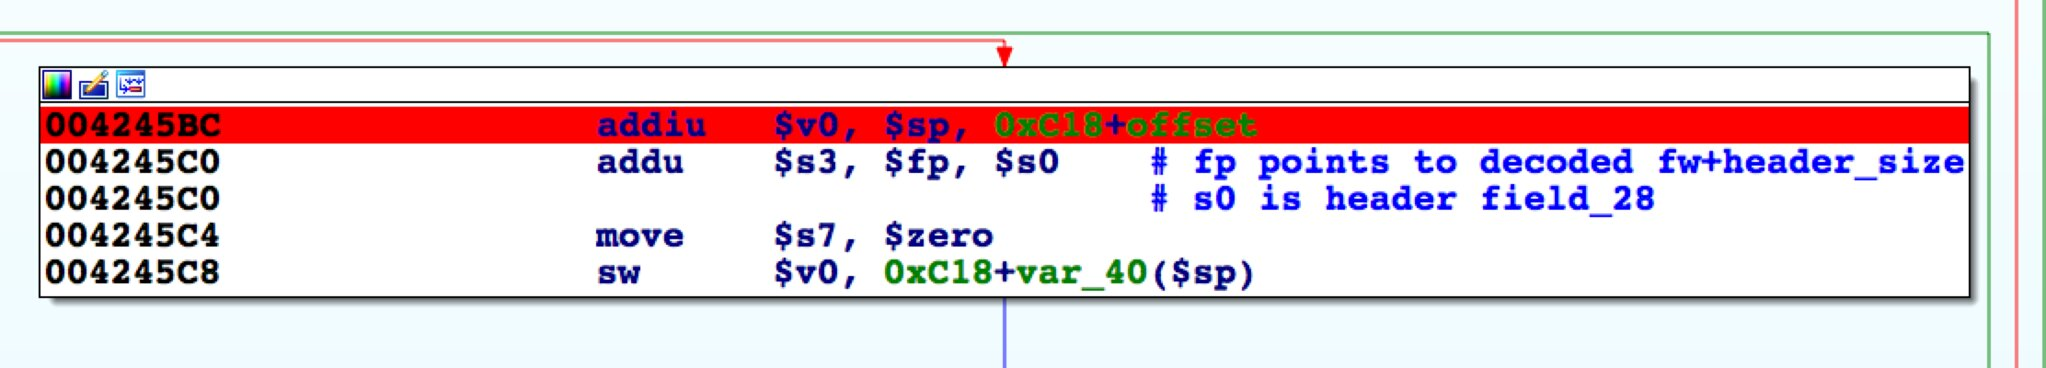 calculate start of firmware data